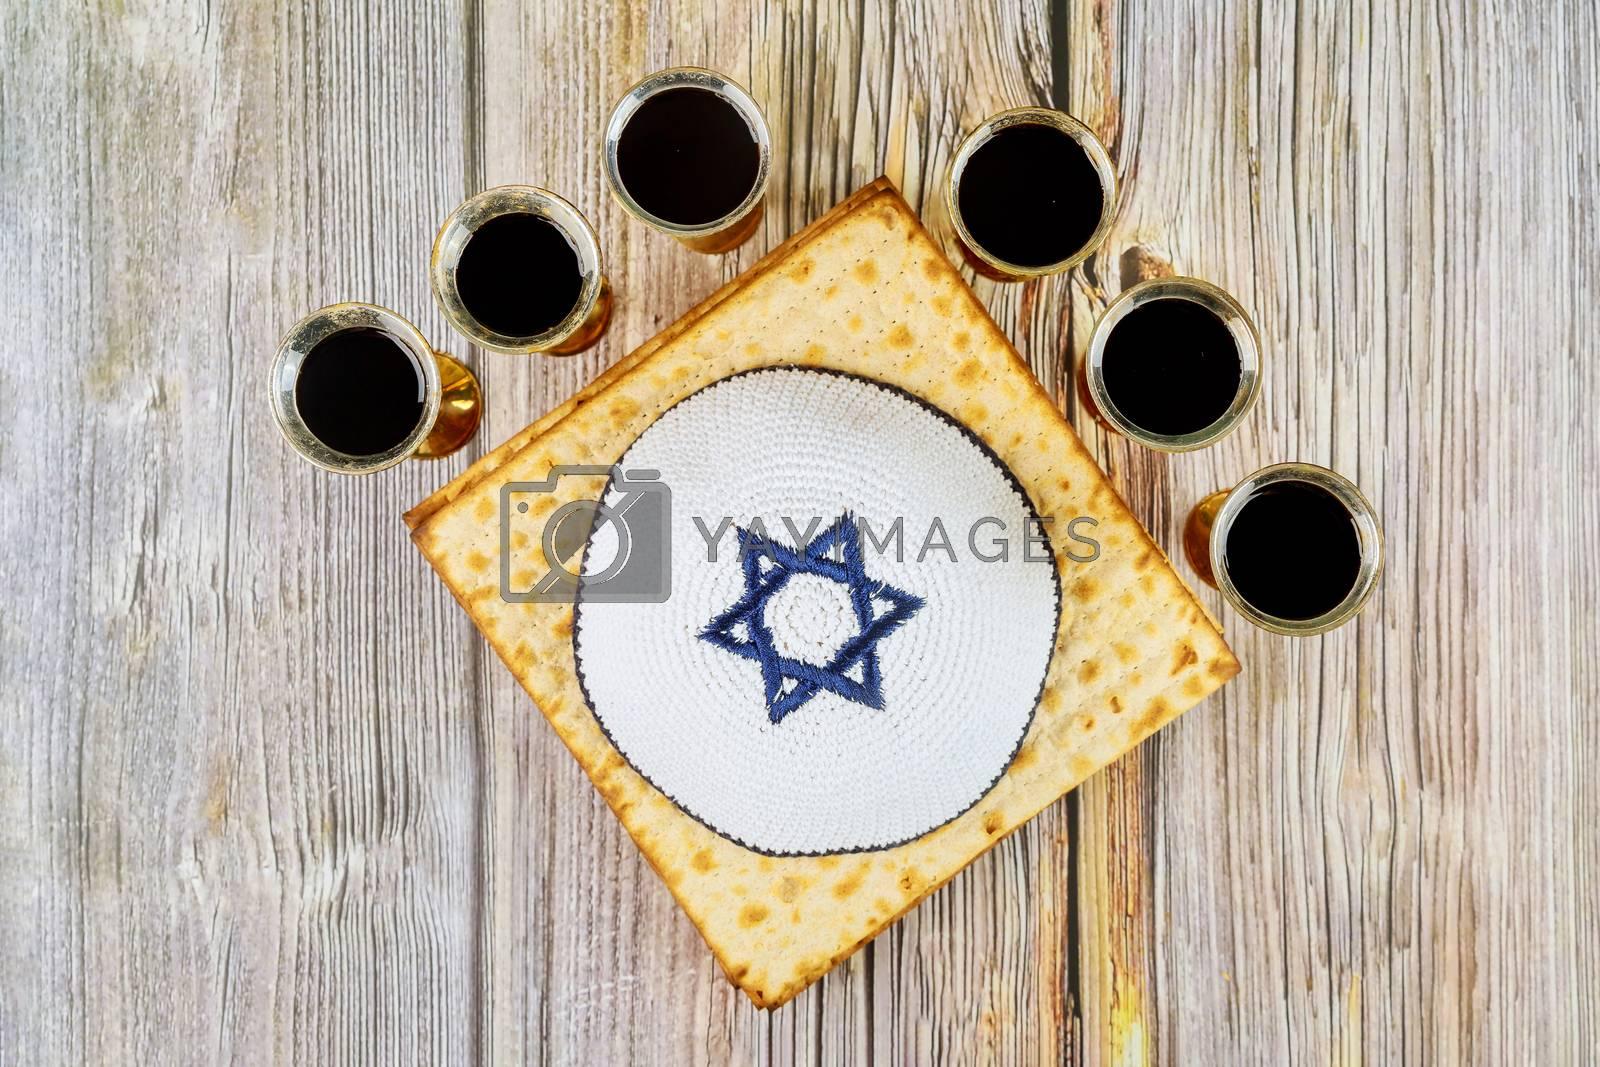 Passover Haggadah a matzo jewish holiday six cup kosher red wine